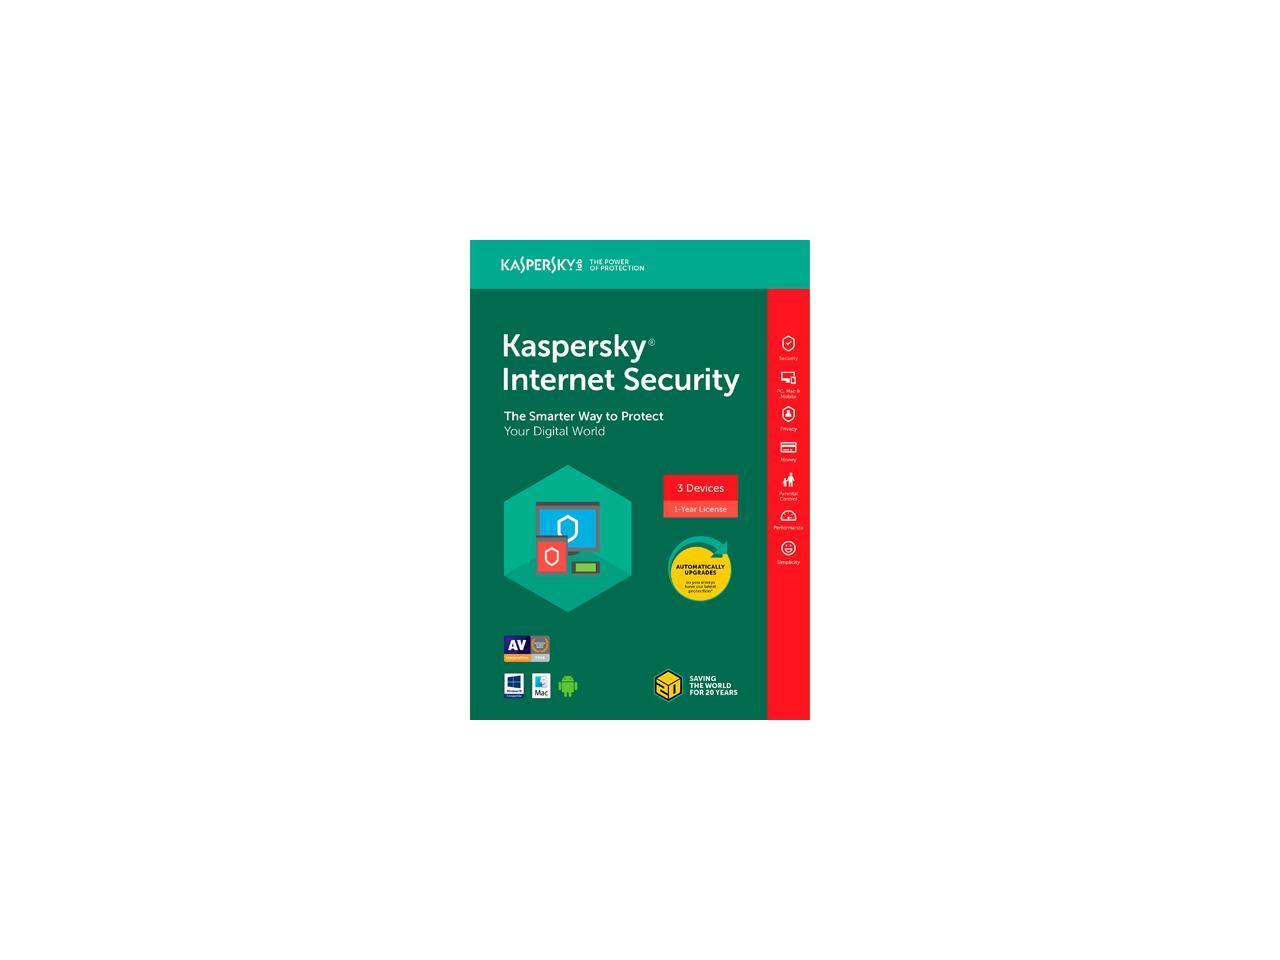 kaspersky internet security 2018 3 devices